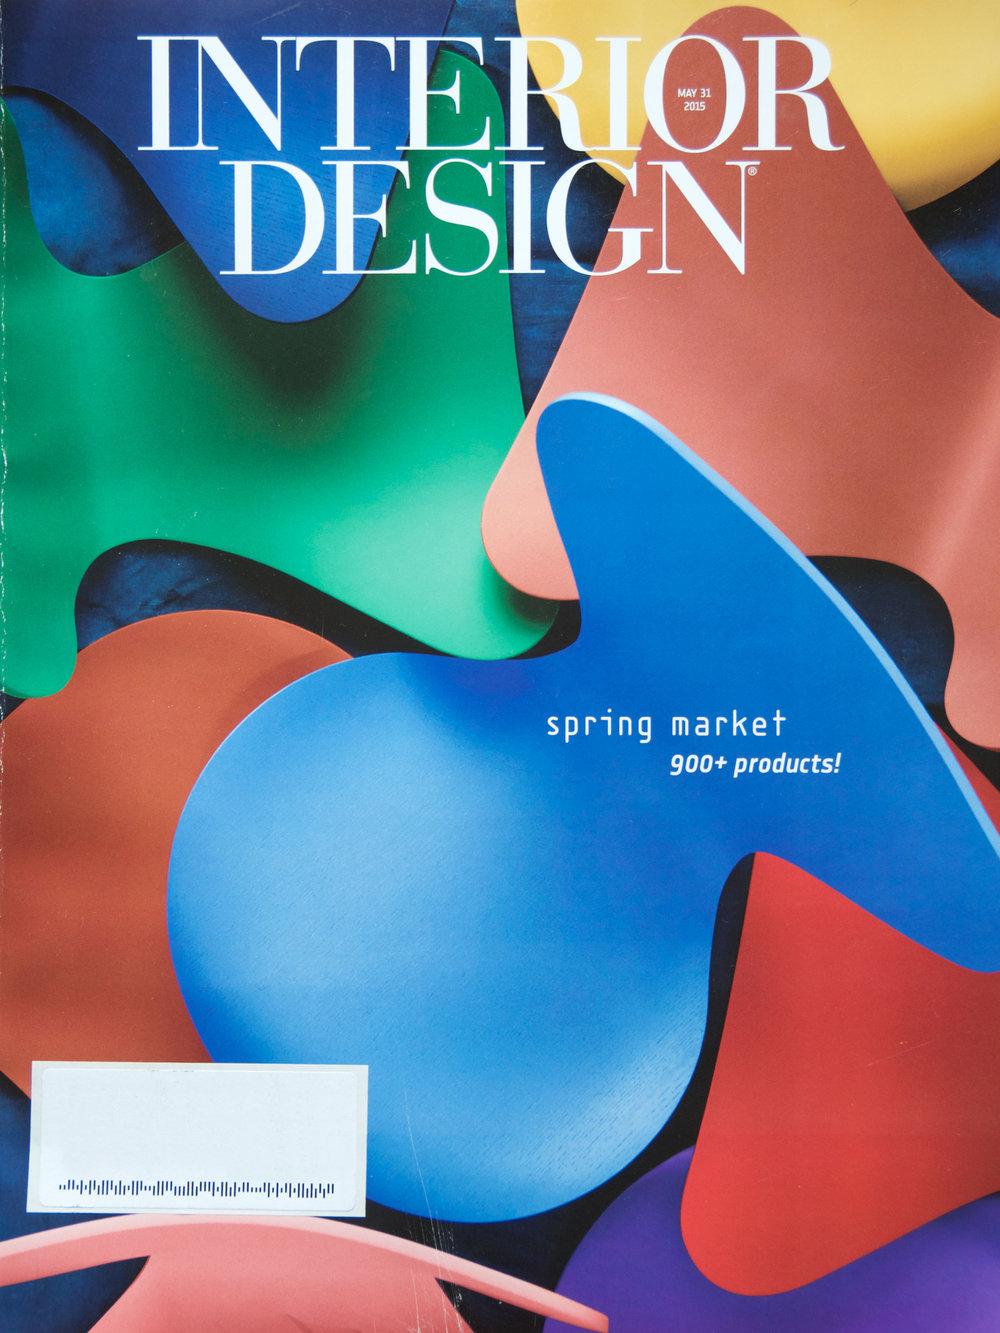 Interior Design 5-2015 A.jpg